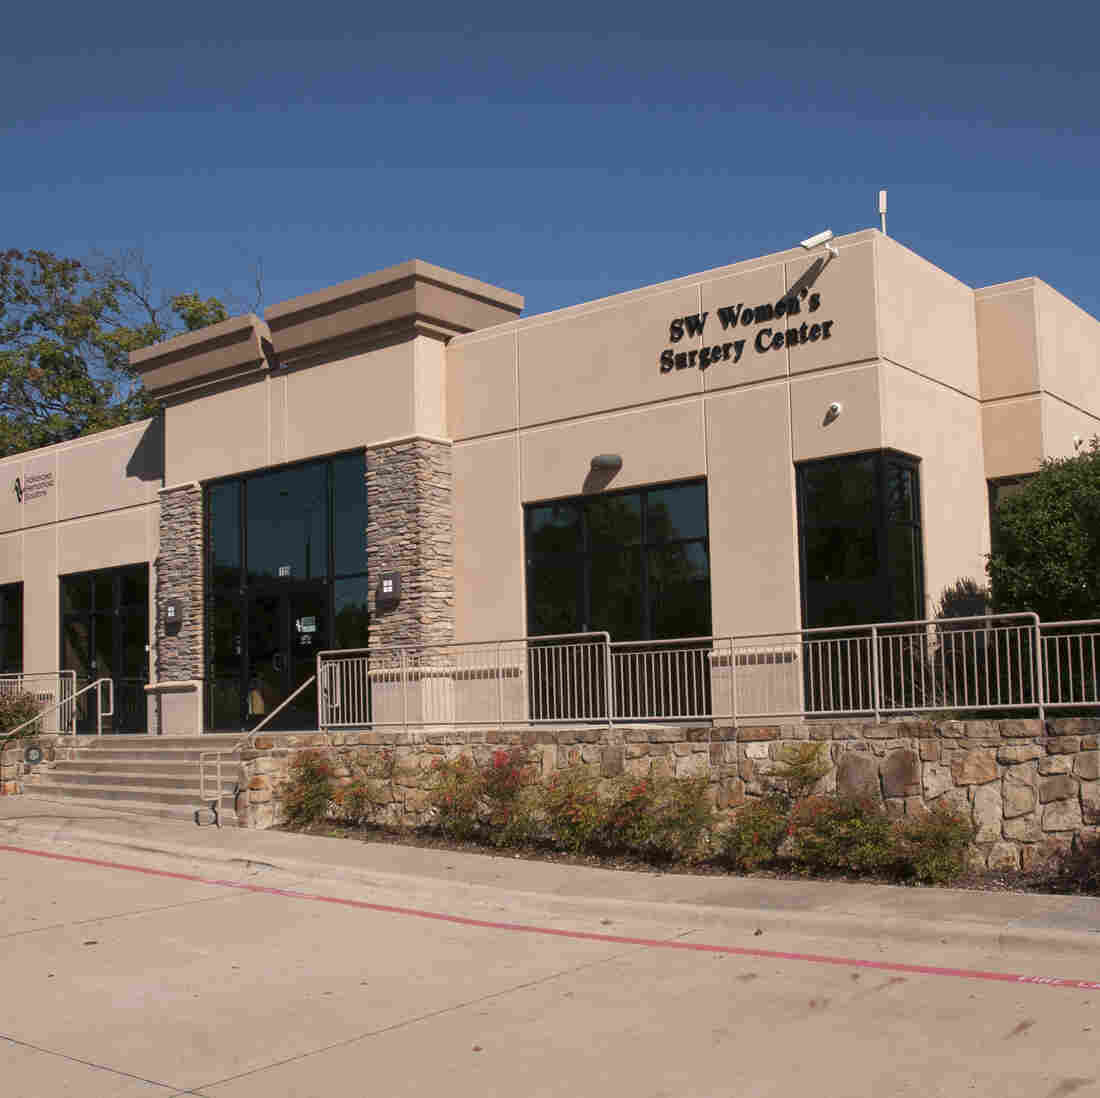 U.S. Court Weighs Texas Law's Burden On Women Seeking Abortions